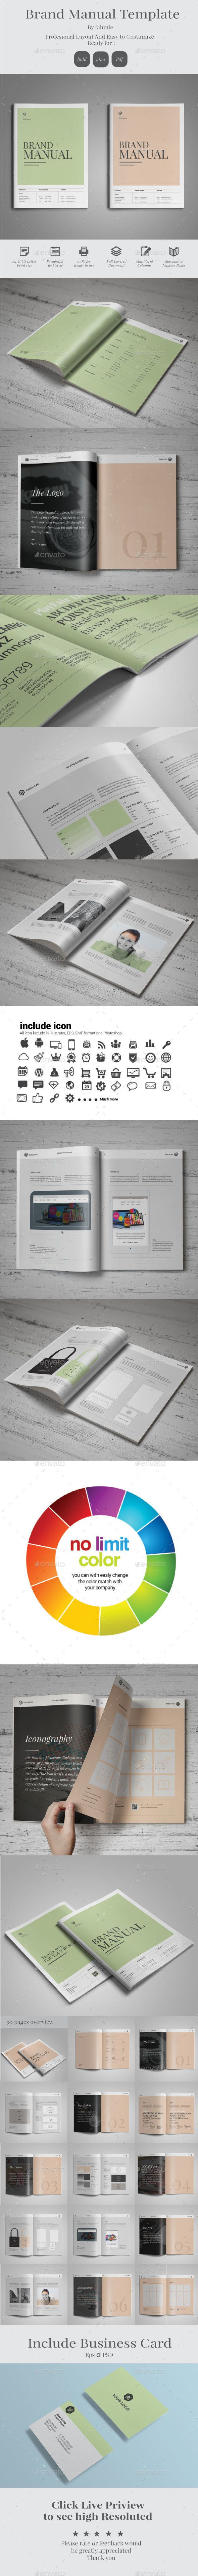 Brand Manual Guidelines #manual #guidelines #branding http://graphicriver.net/item/brand-manual/14040938